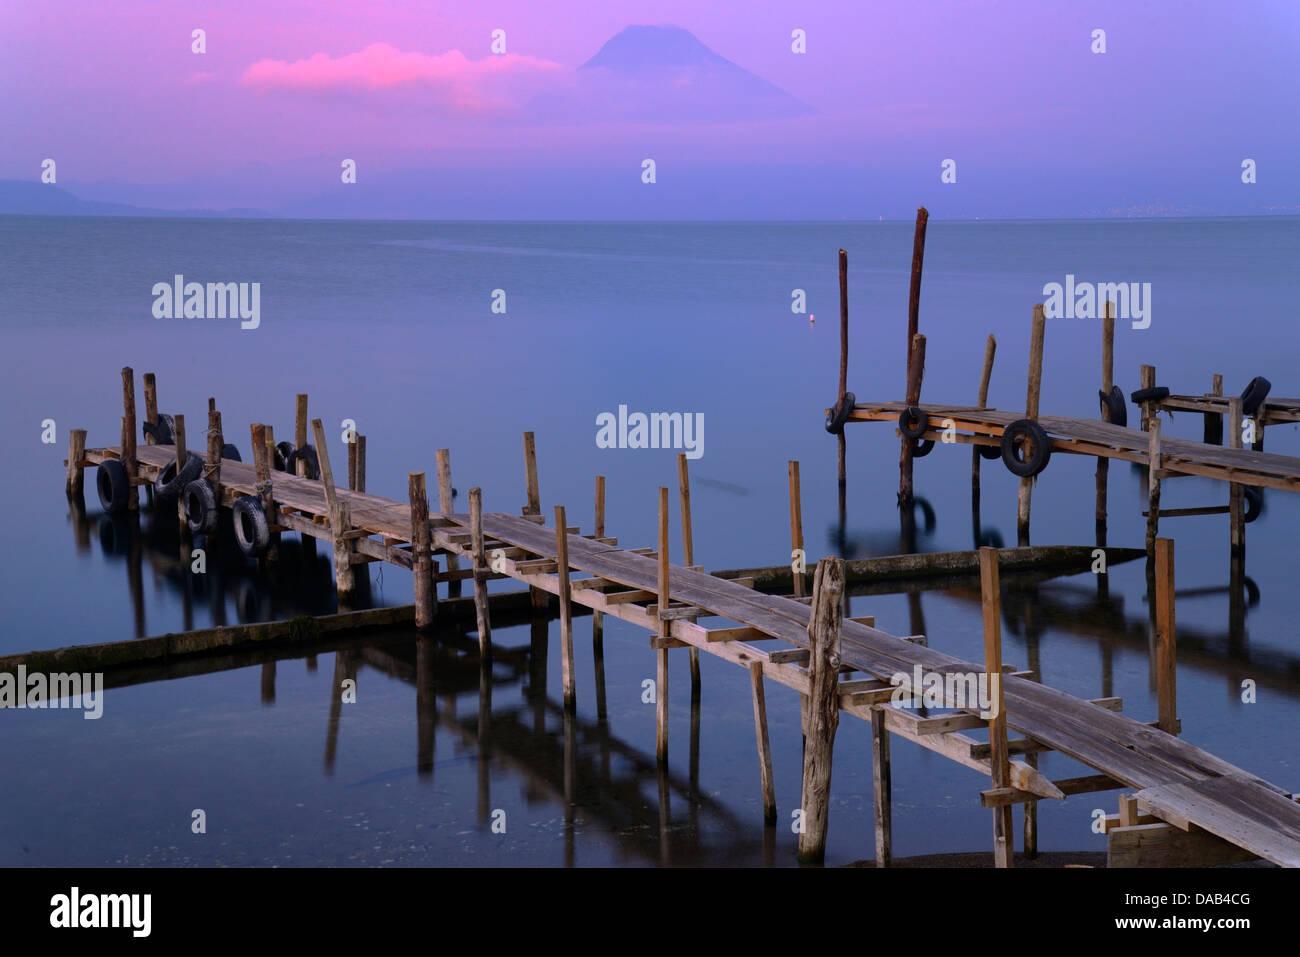 Central America, Guatemala, Lago de Atitlan, lake, Panajachel, pier, atitlan, volcano, rim of fire, landscape, pier, - Stock Image